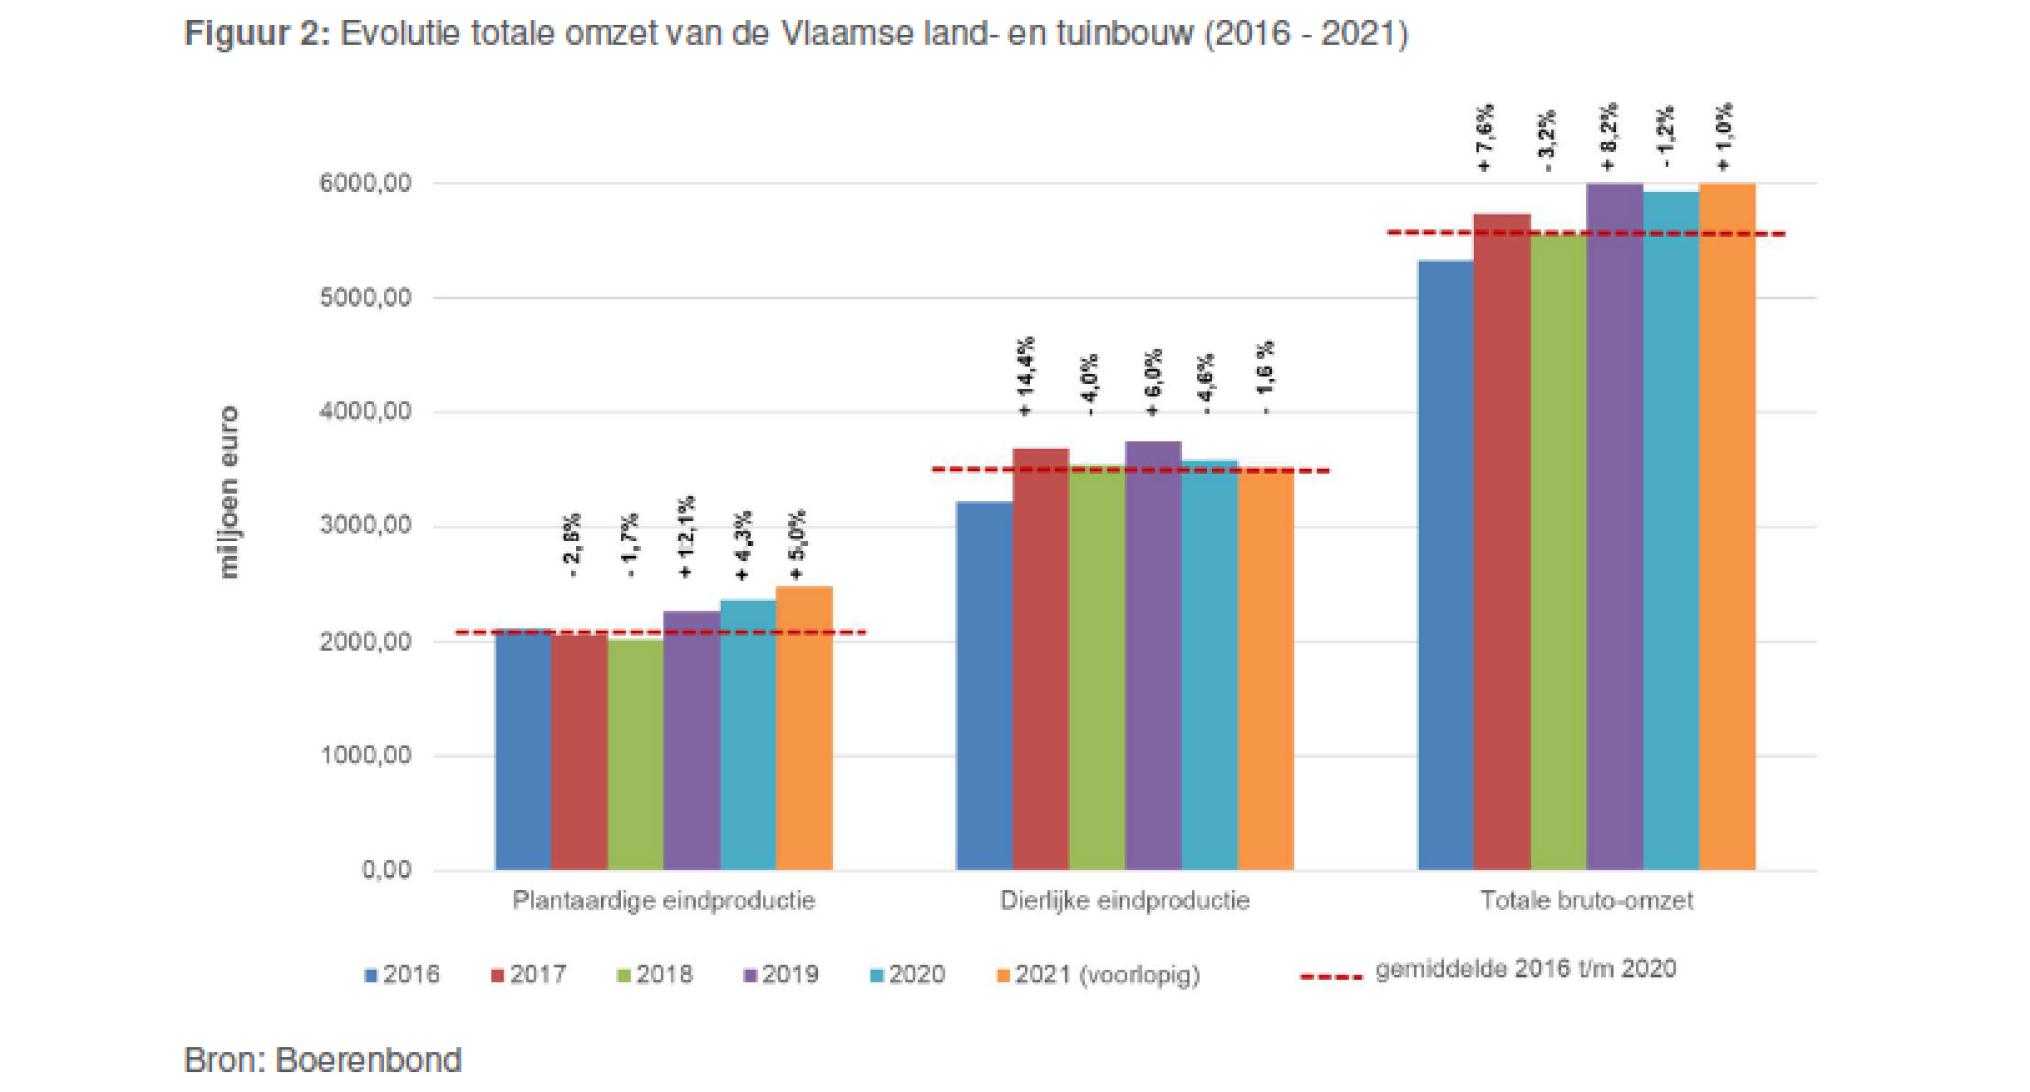 Grafiek totale omzet landbouw 2021_Boerenbond